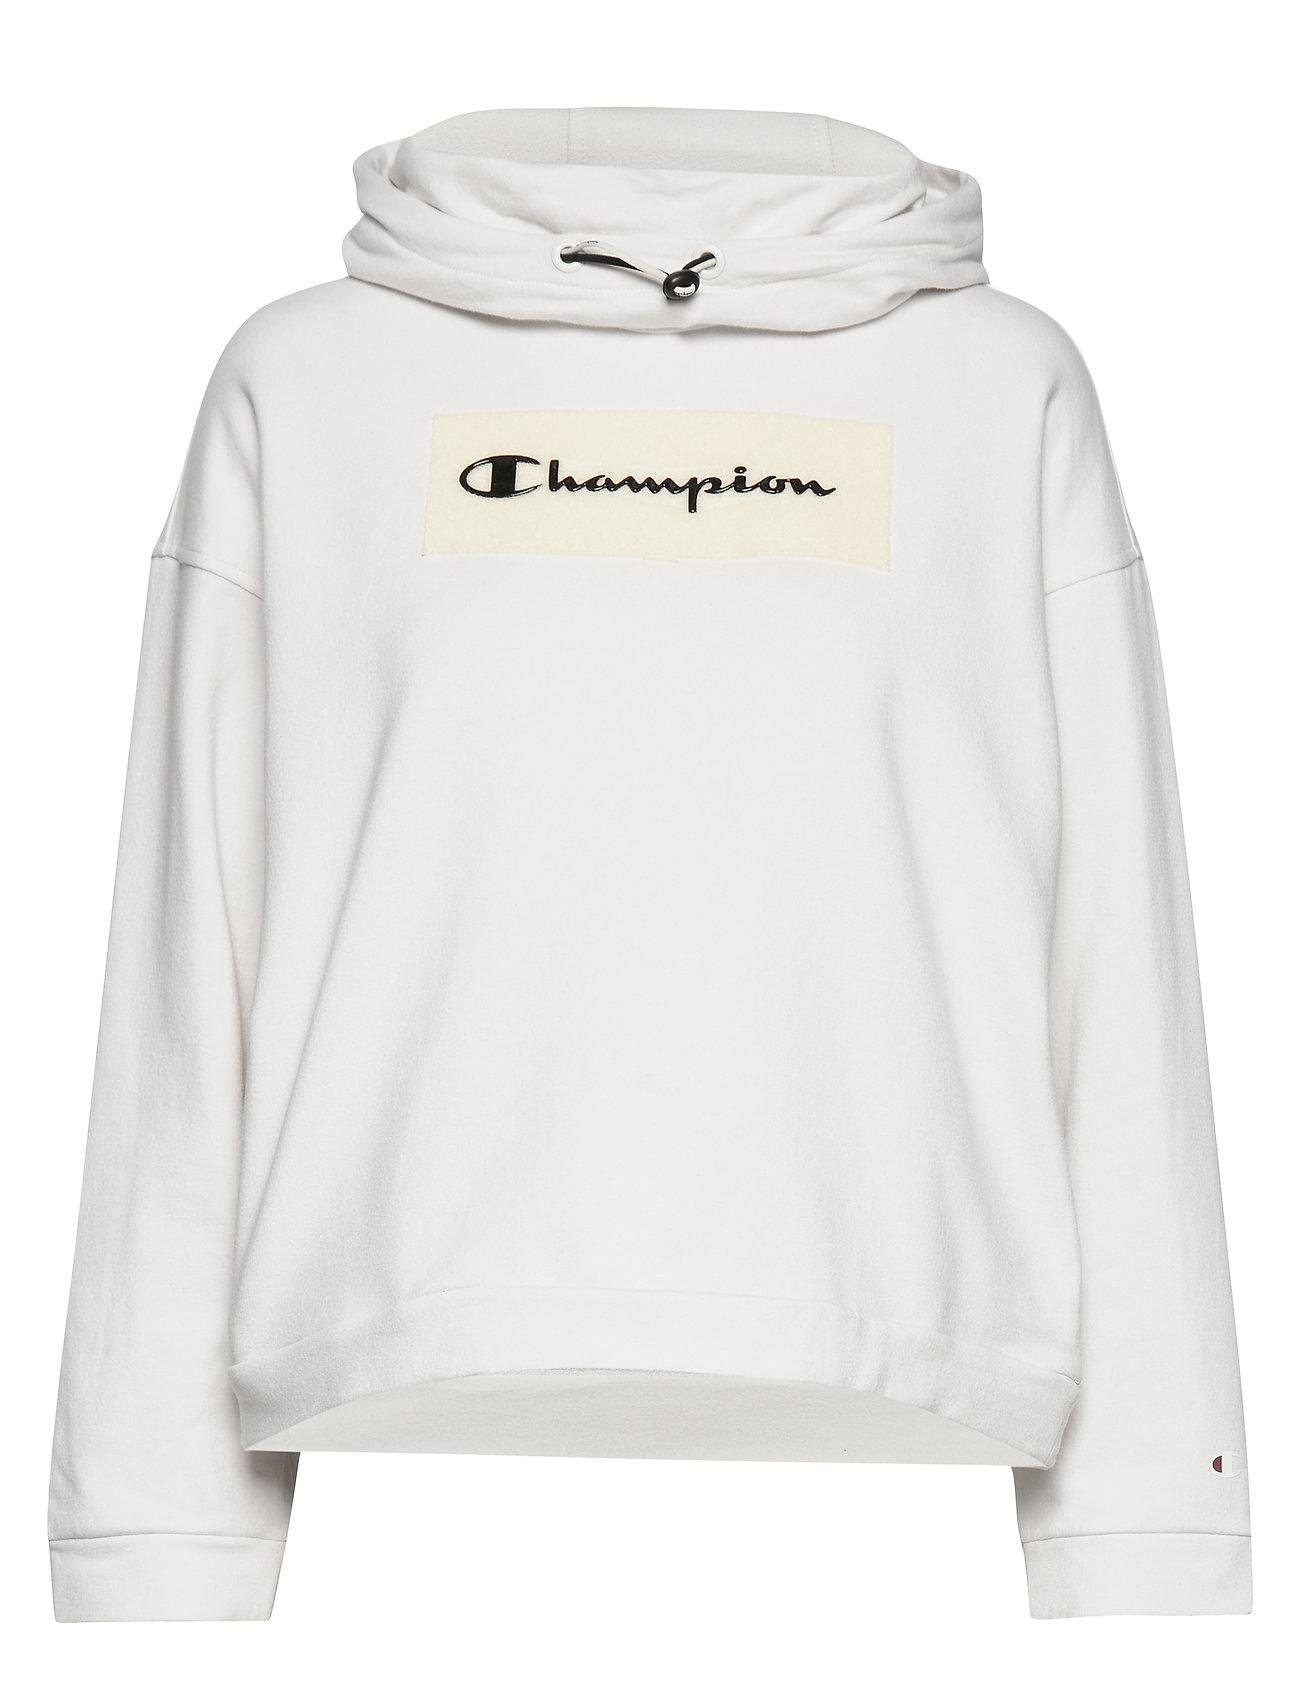 Champion Hooded Sweatshirt - VAPOROUS GRAY